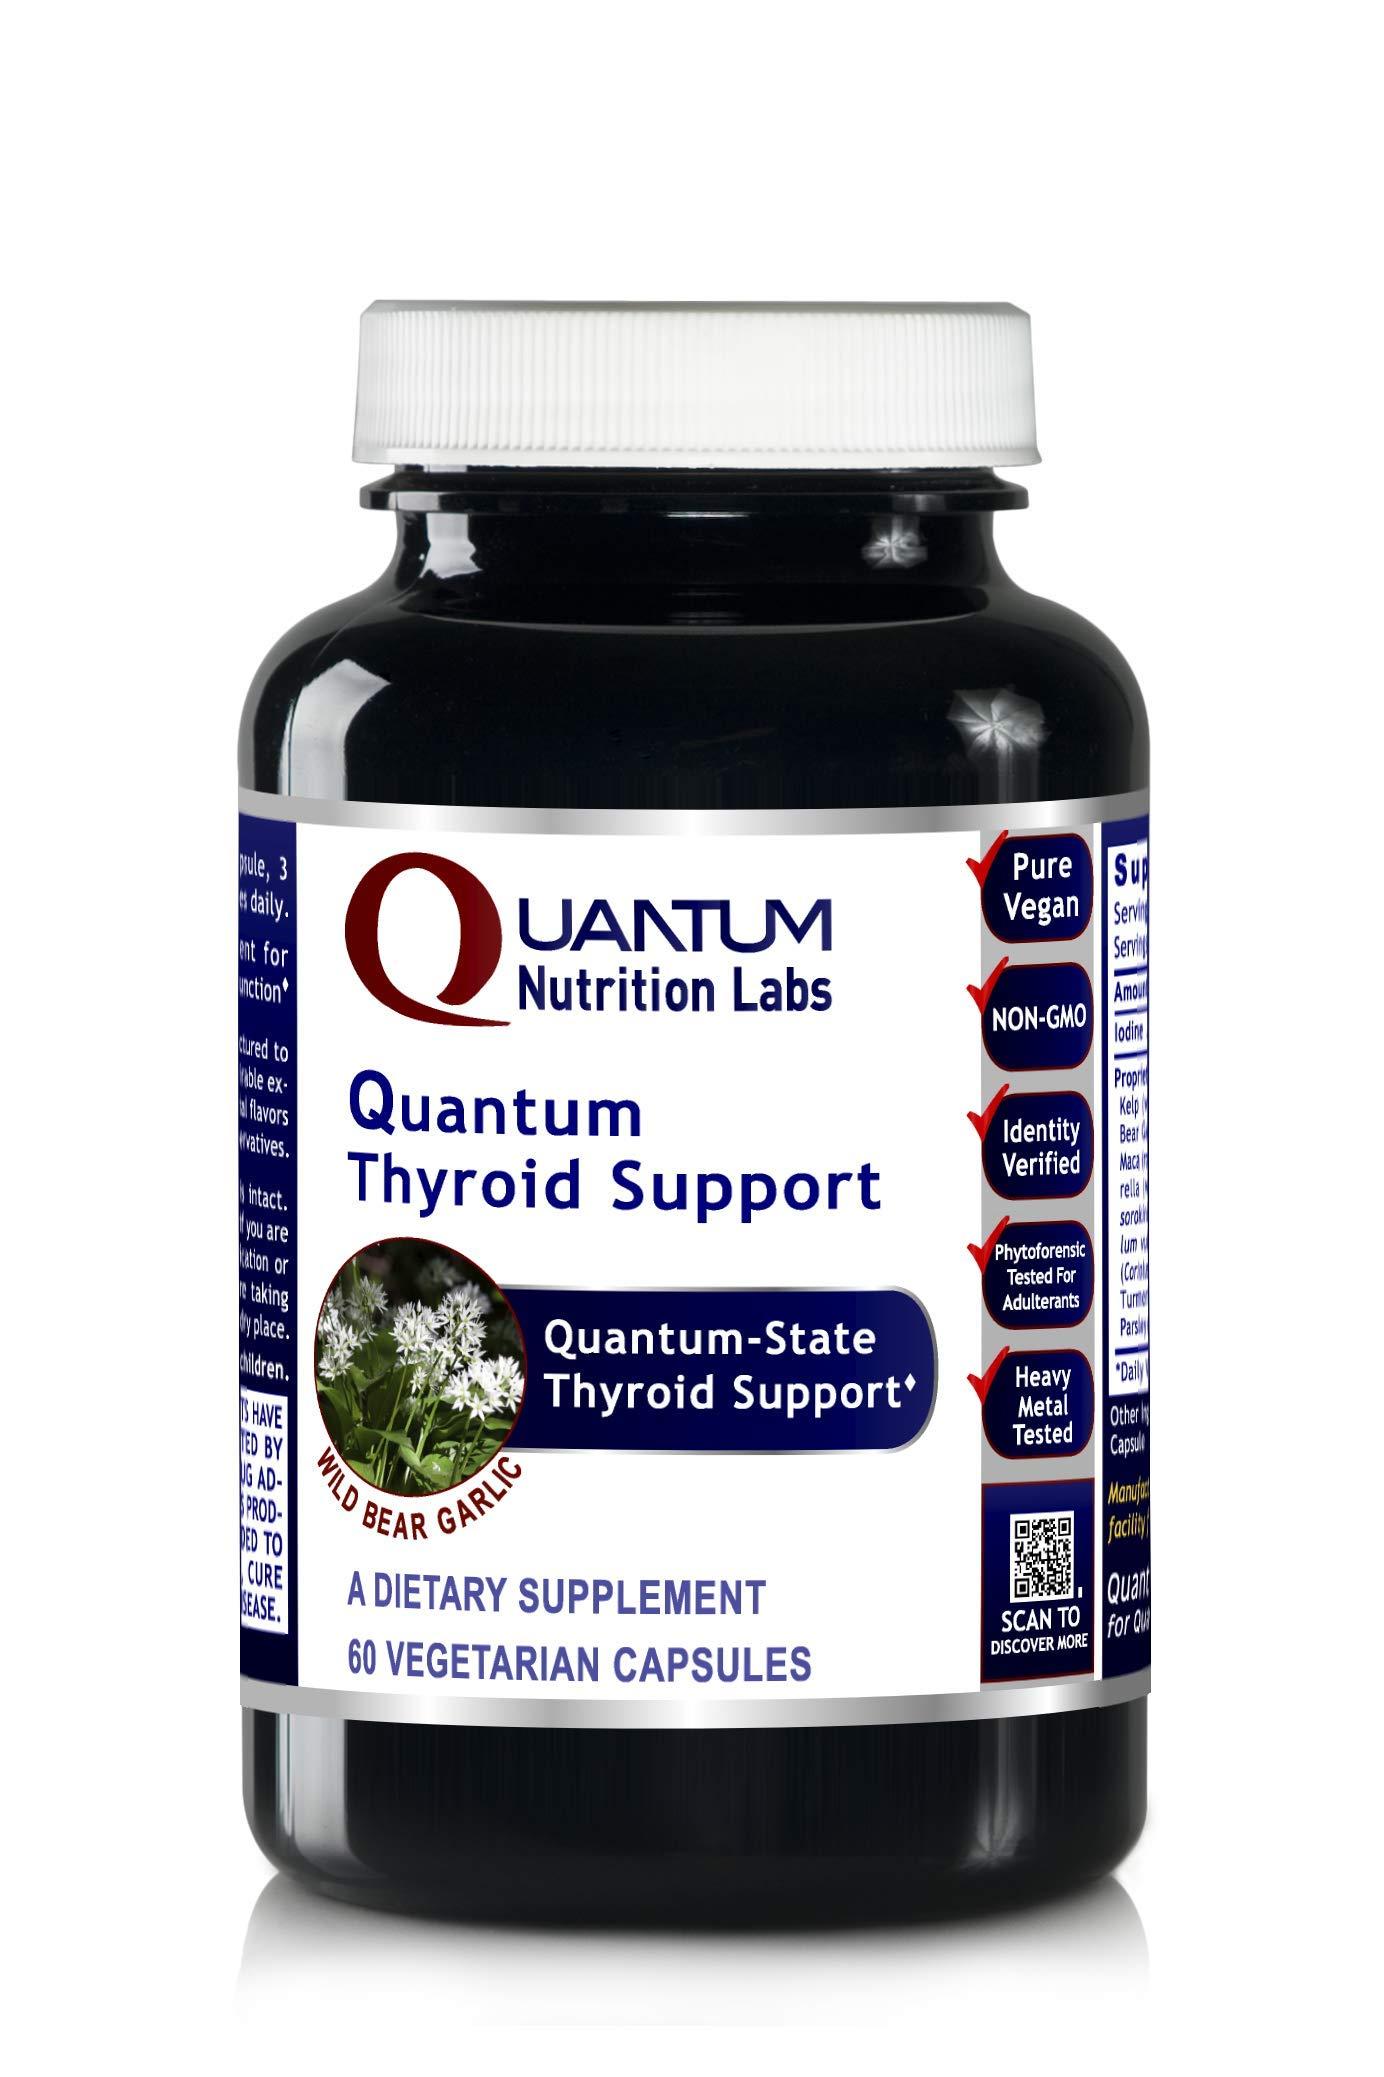 Quantum Thyroid Support, 60 Vegetarian Capsules - Quantum-State Detoxification and Thyroid Support